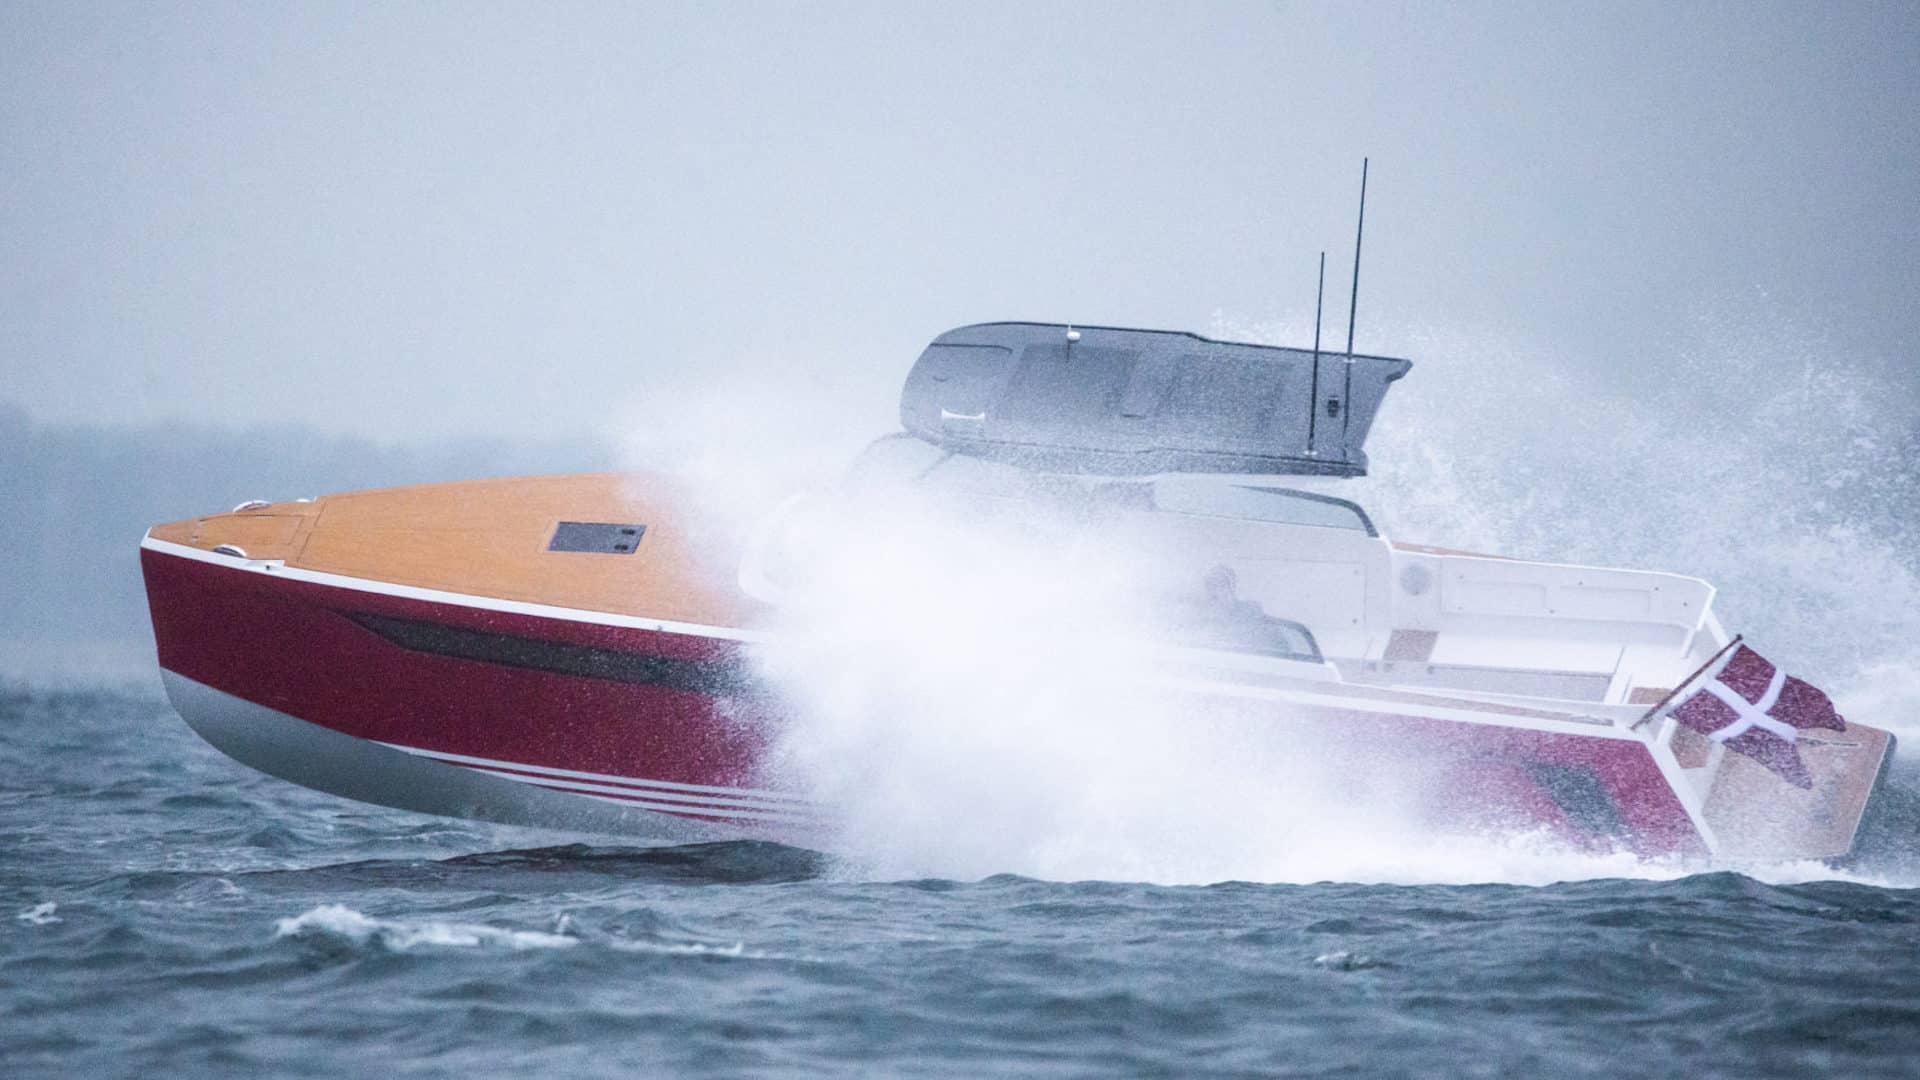 X-Yachts X-Power 33C 5